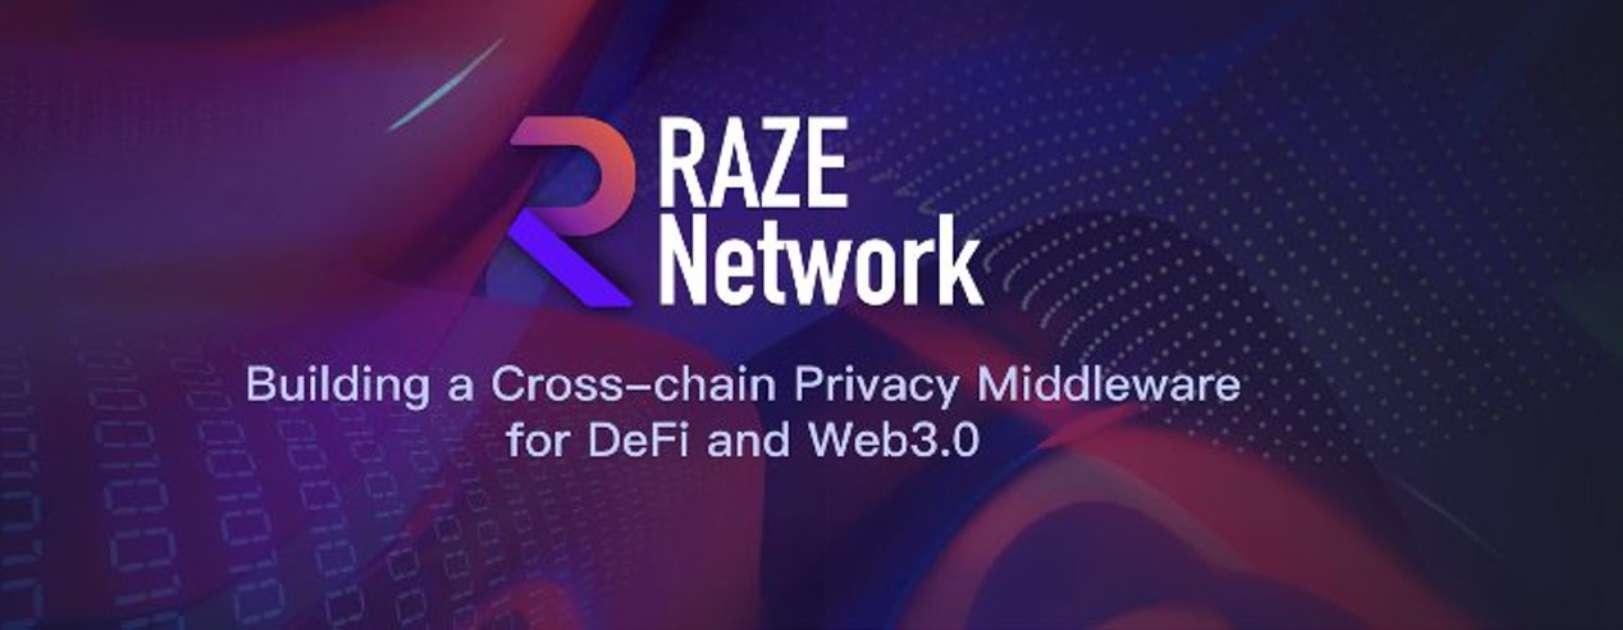 Raze Networks begins Initial DEX Offering on DuckStarter, PoolZ, Bounce